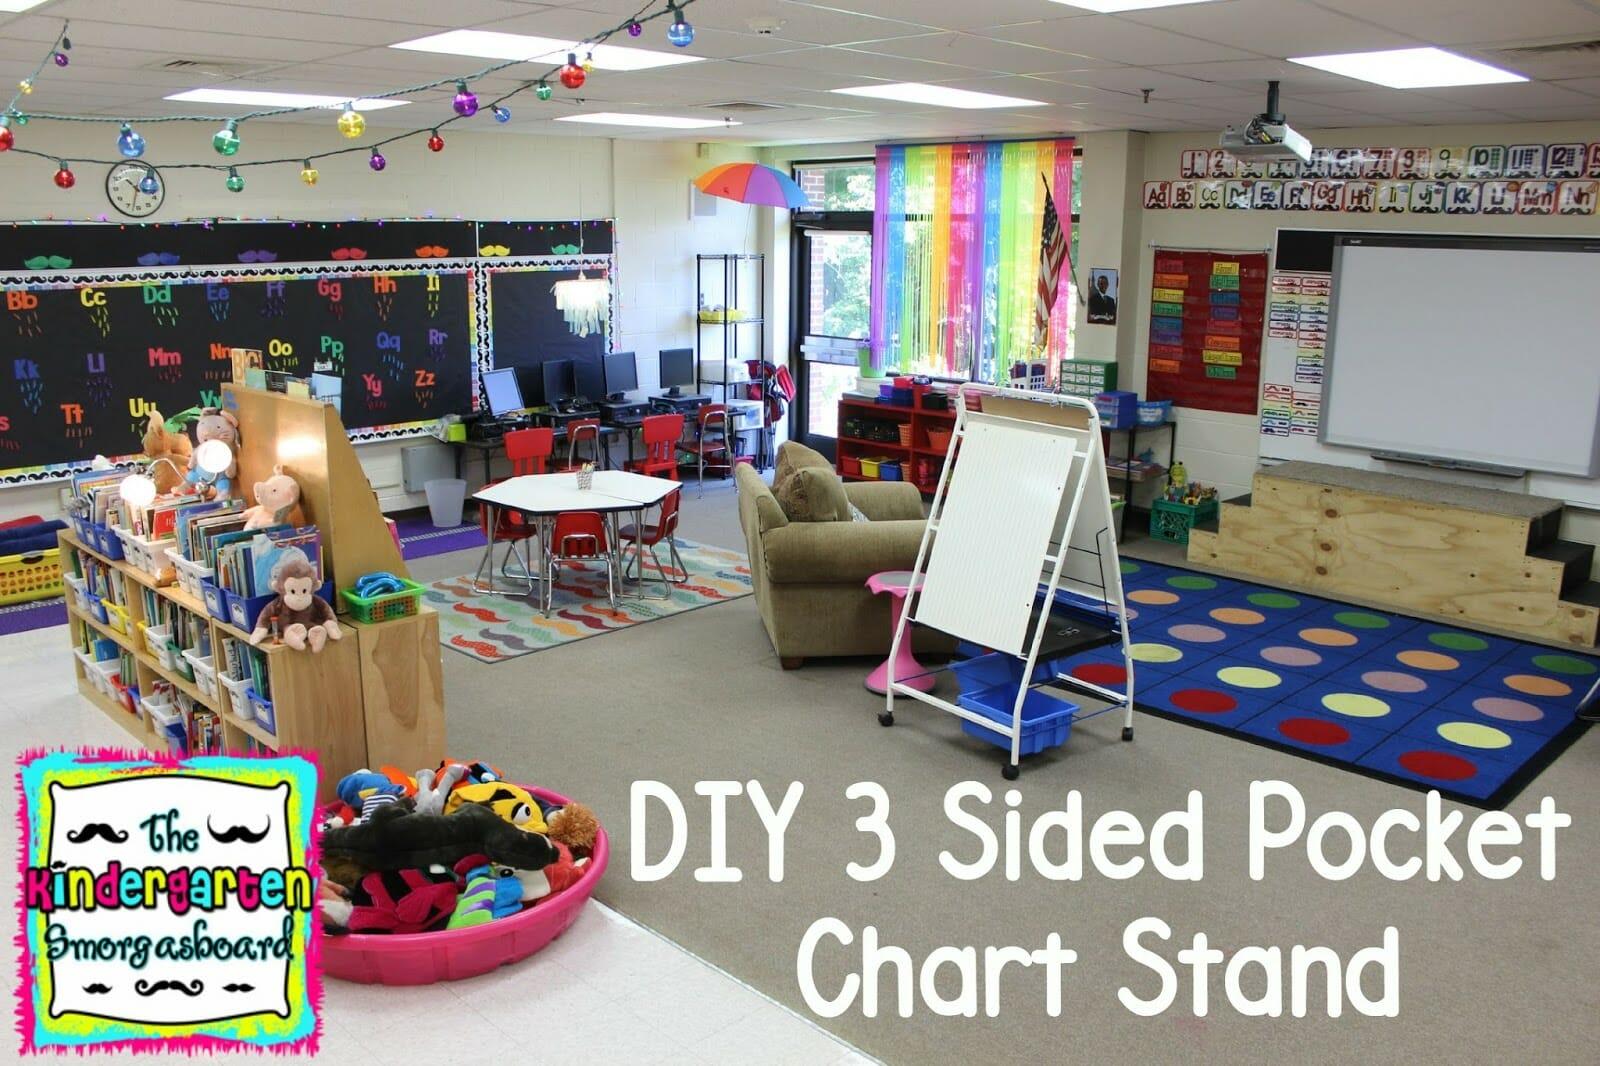 A Kindergarten Smorgasboard Diy 3 Sided Pocket Chart Stand